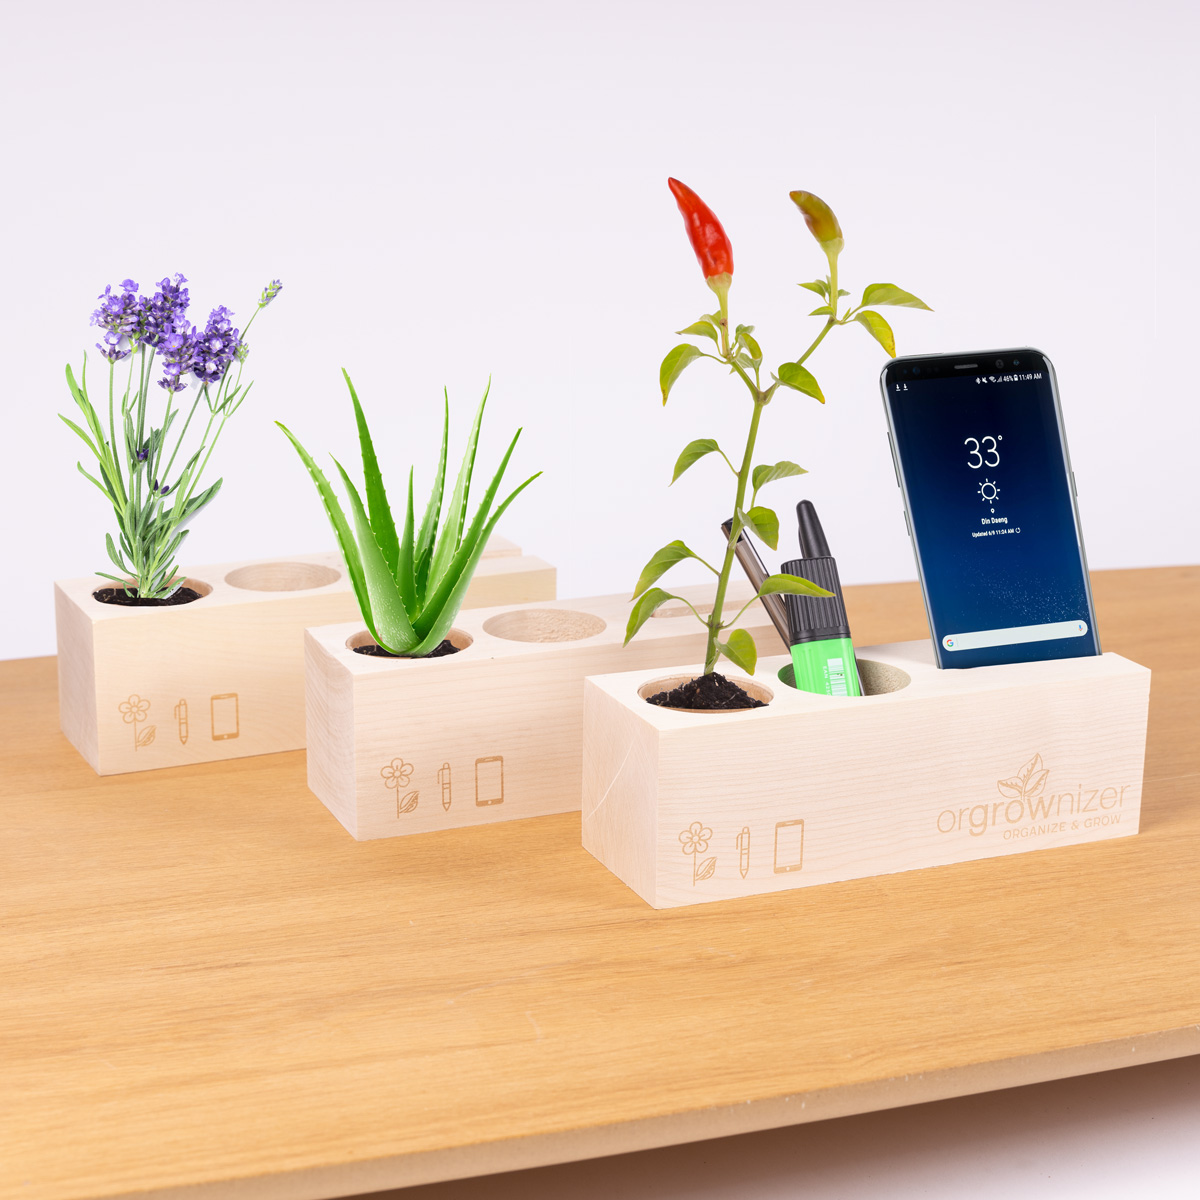 Orgrownizer - Organisateur de bureau avec plante